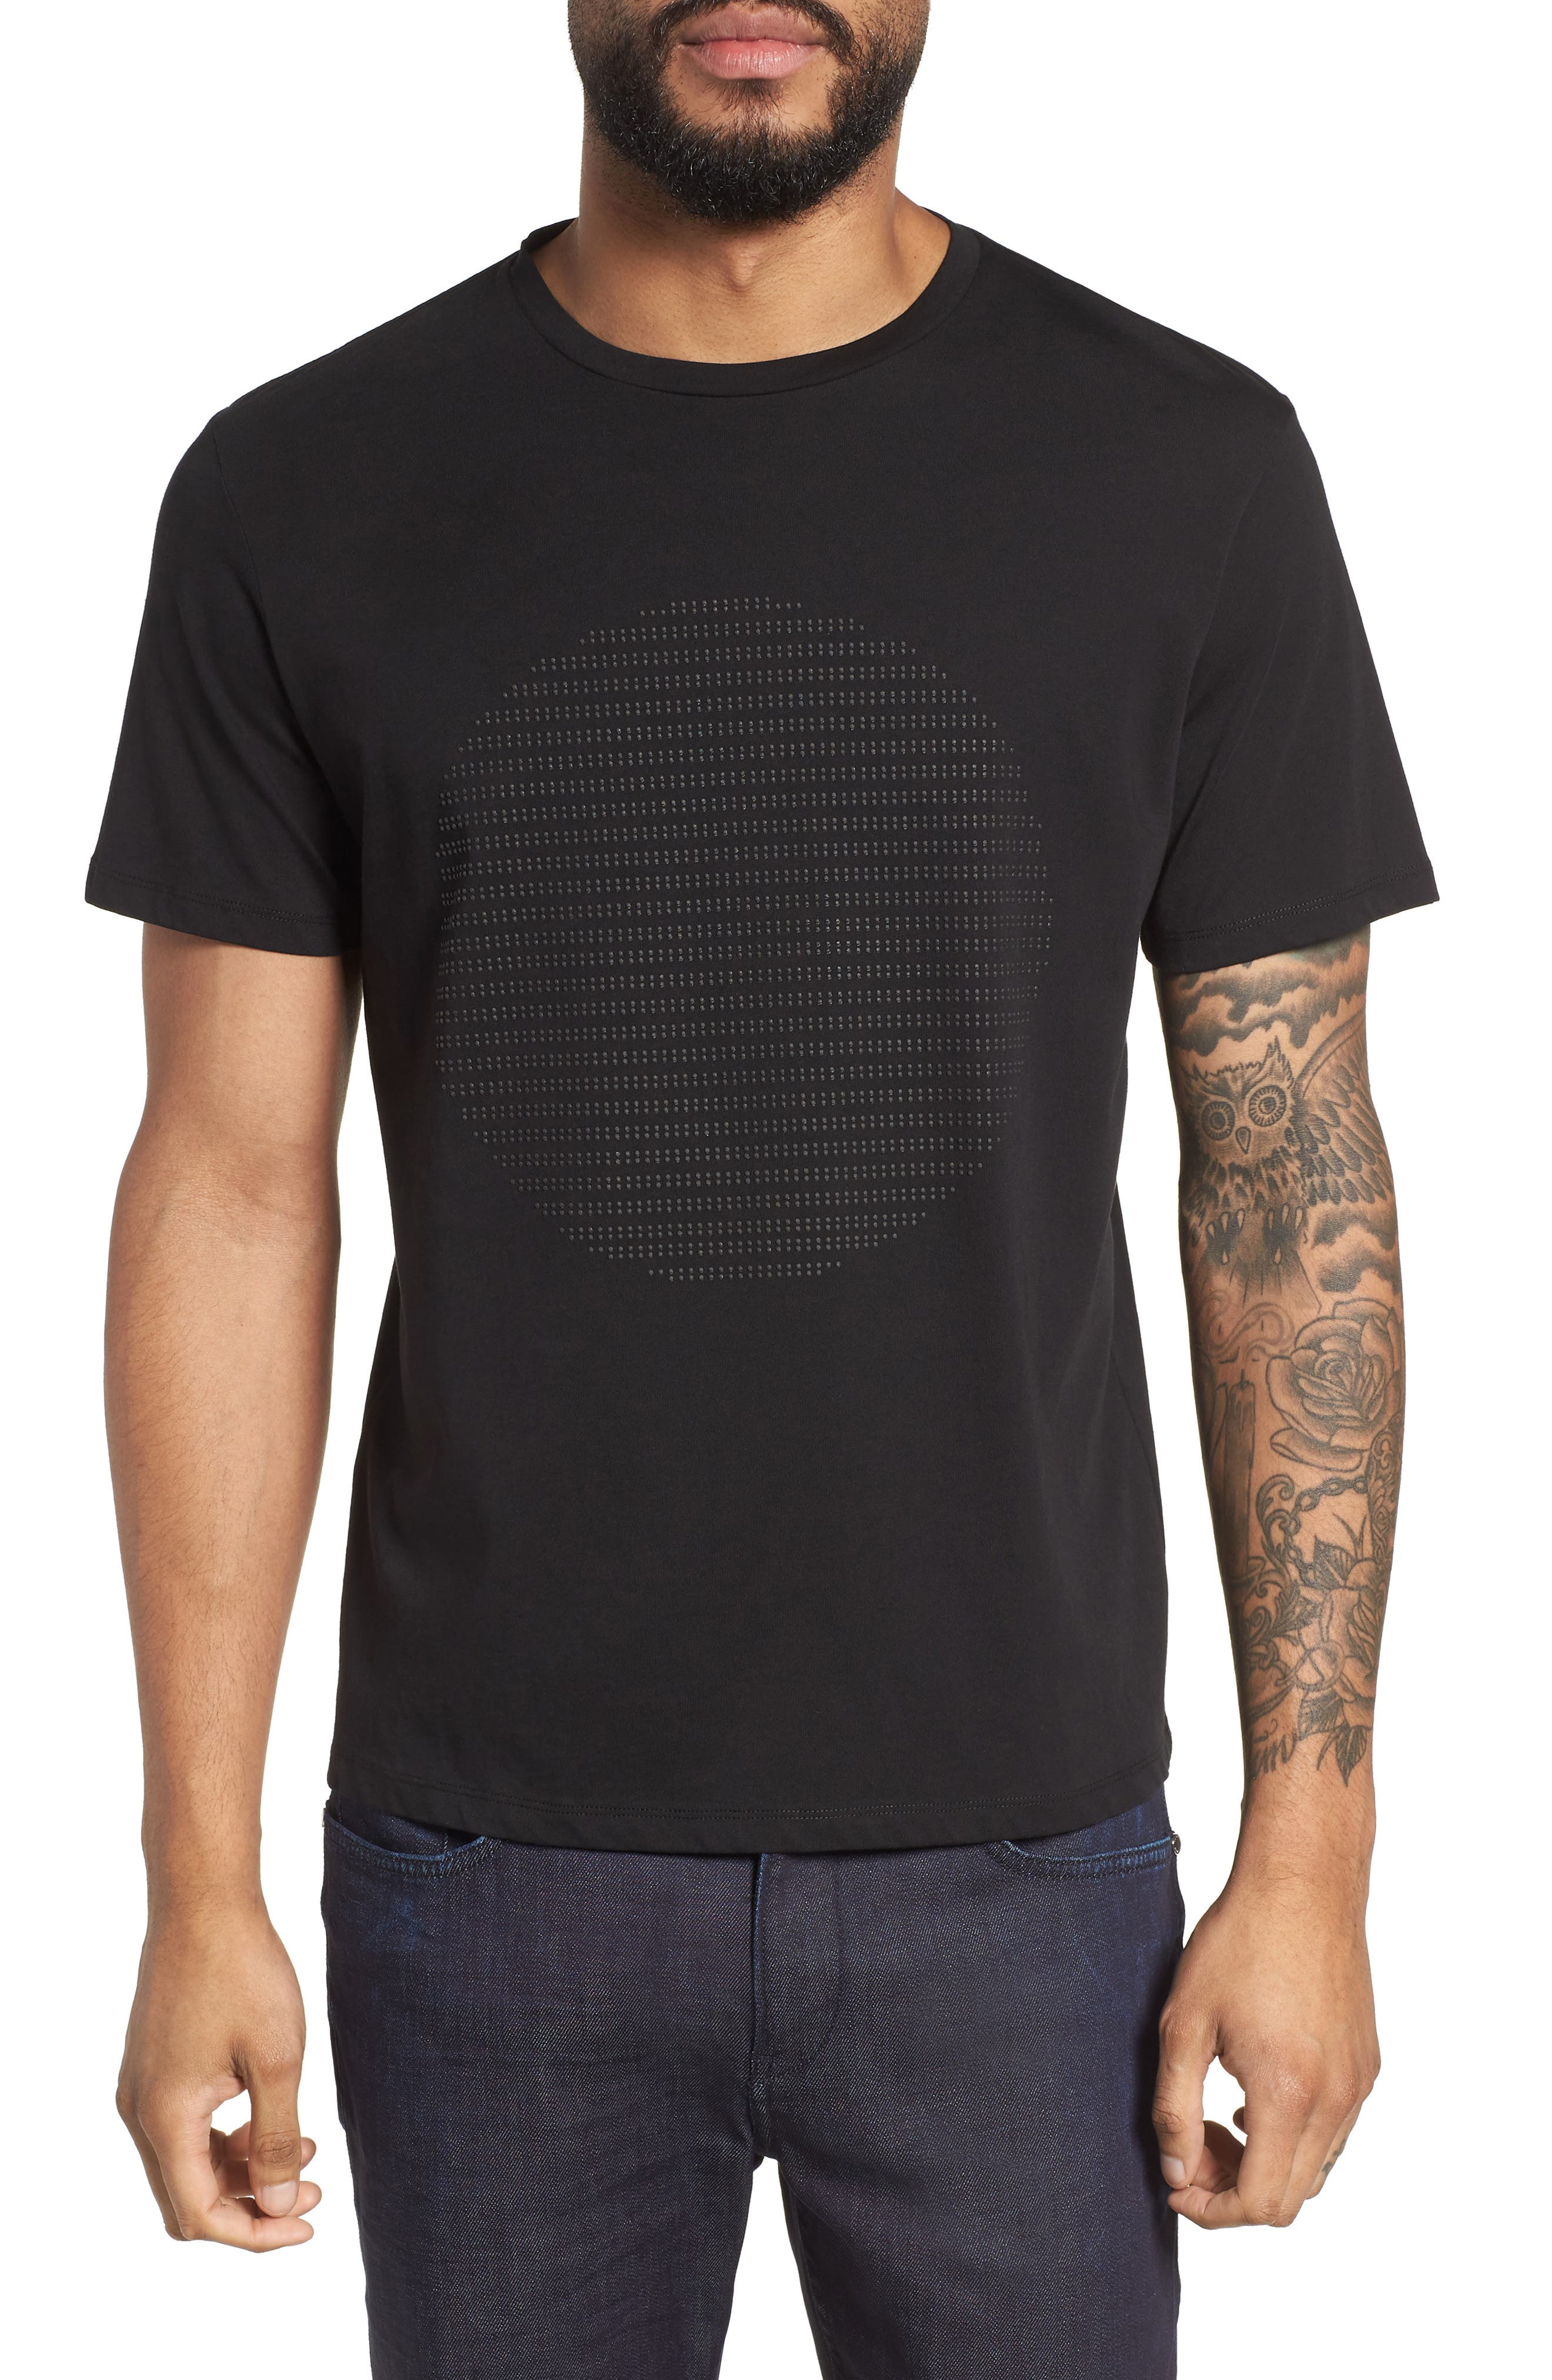 Theory Lunar Crewneck Cotton T-Shirt